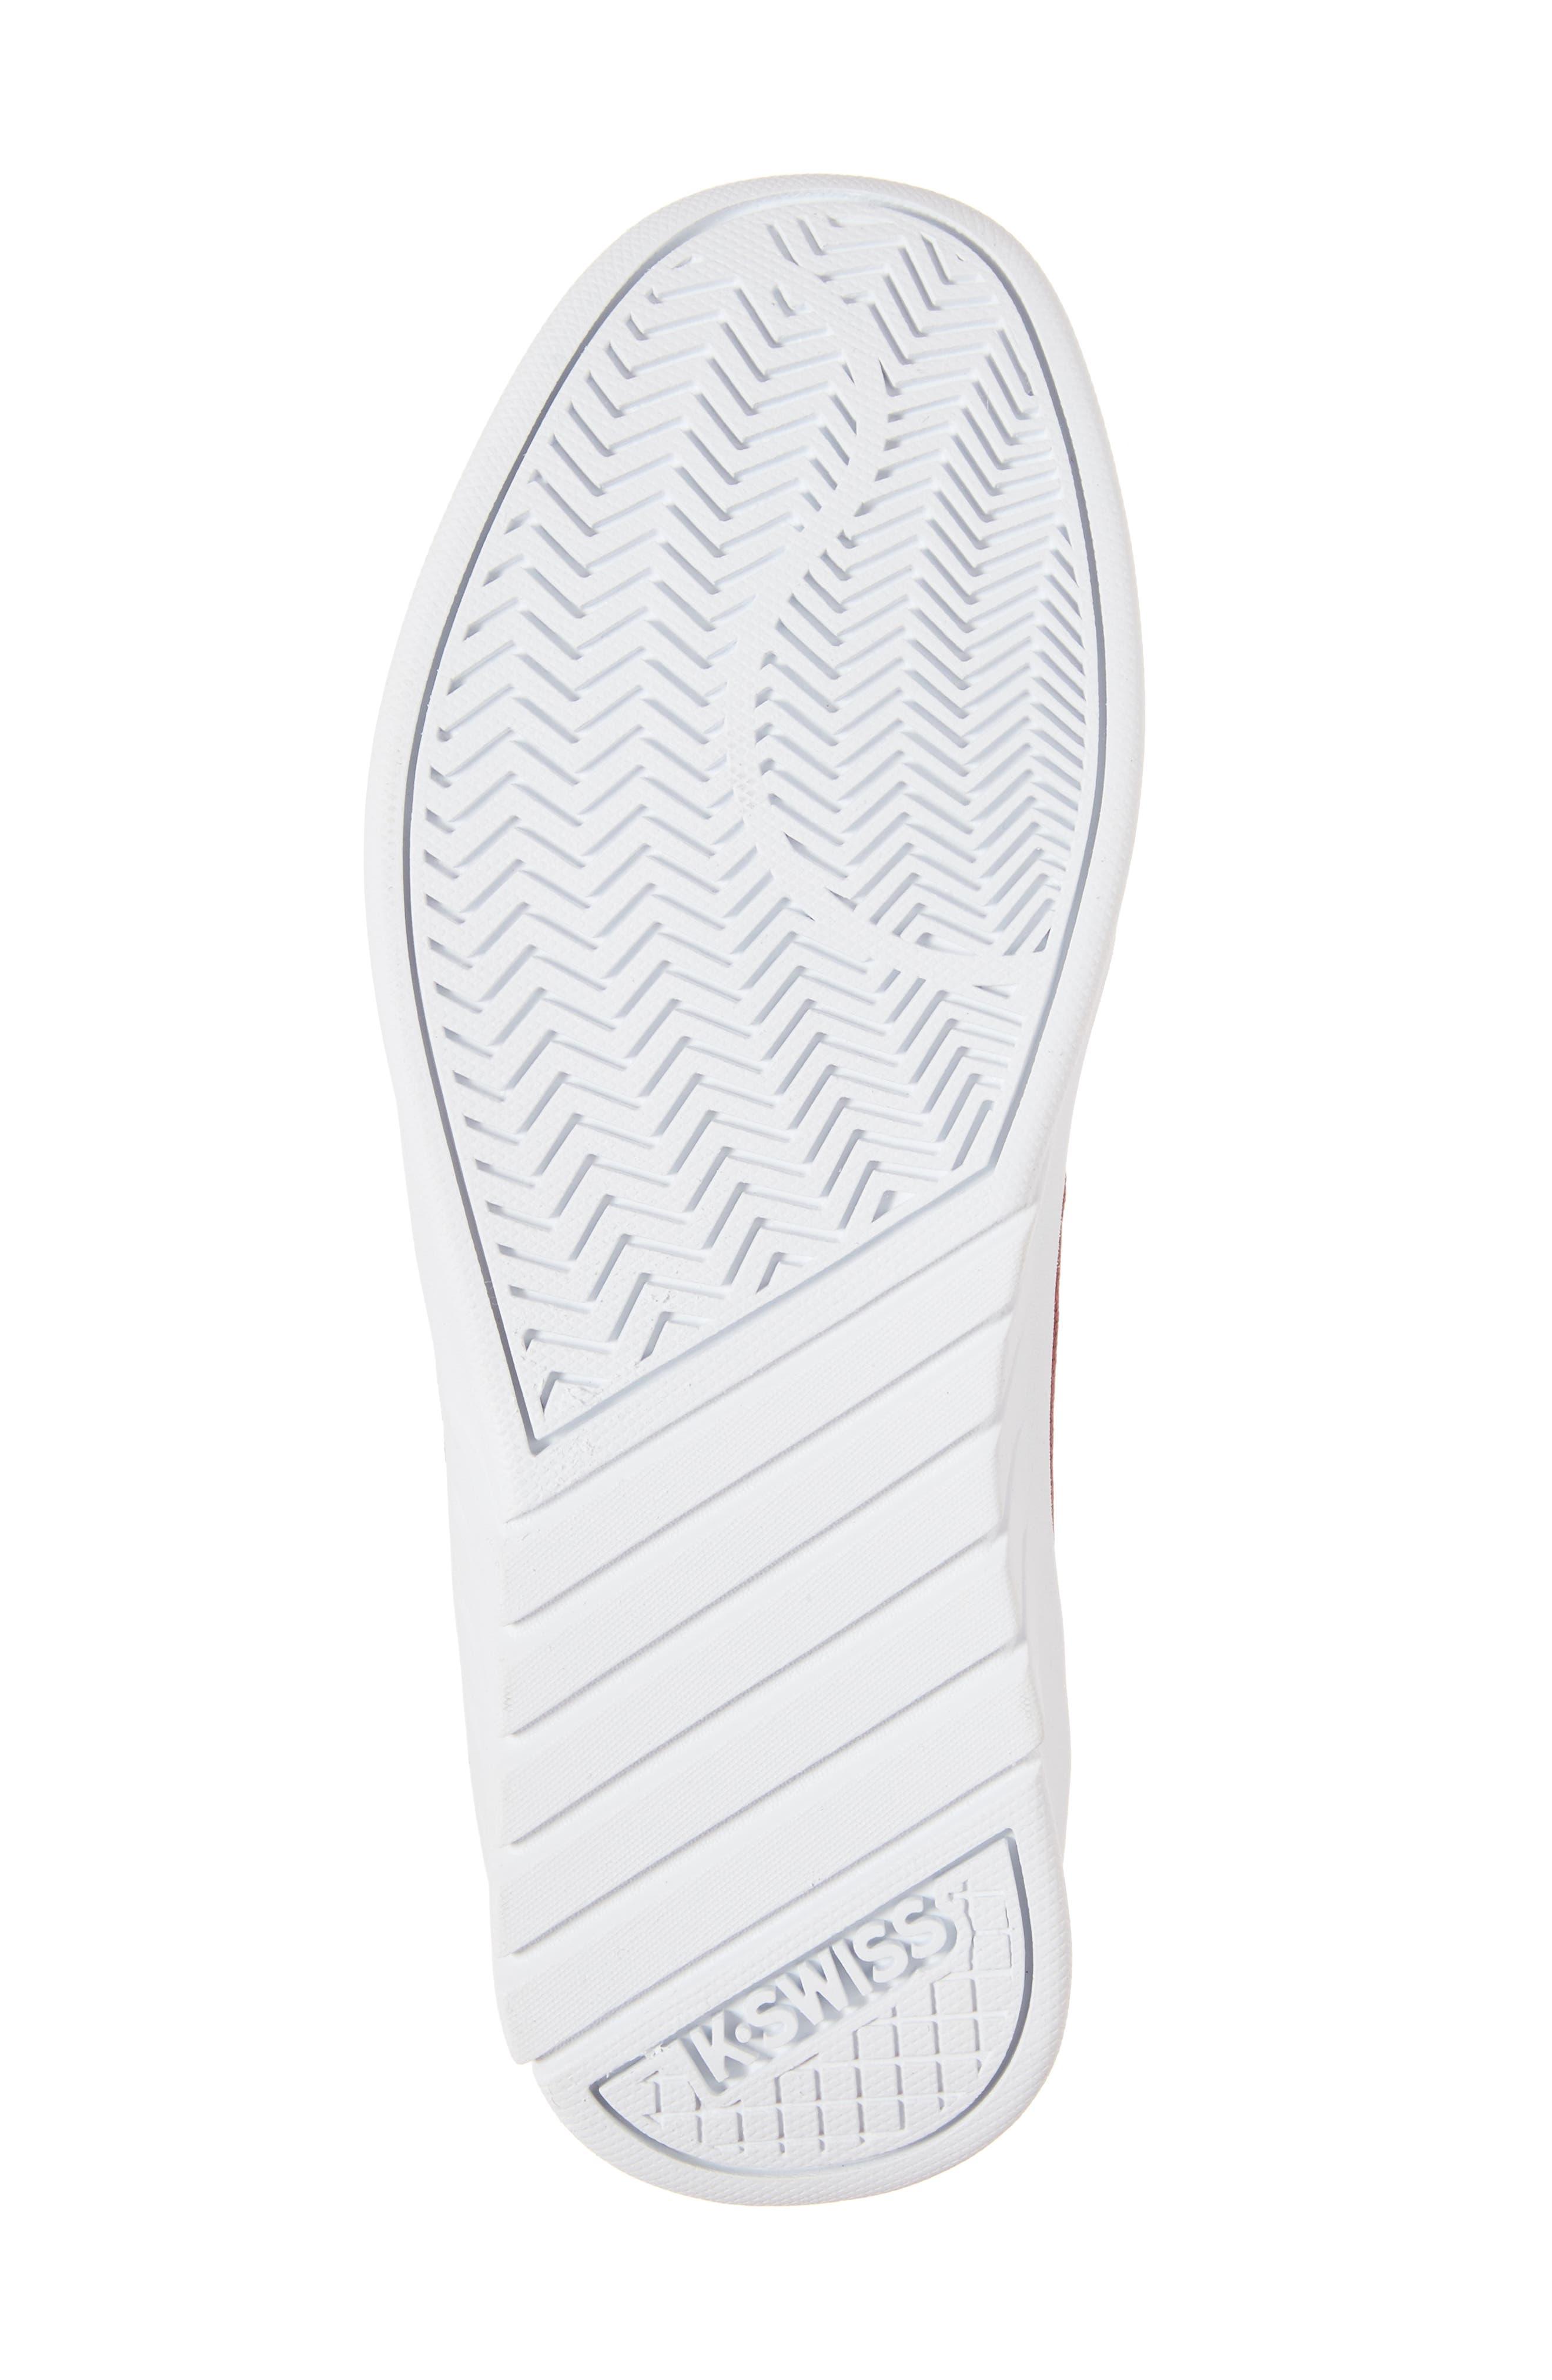 Aero Trainer T Sneaker,                             Alternate thumbnail 6, color,                             Tibetan Red/ White